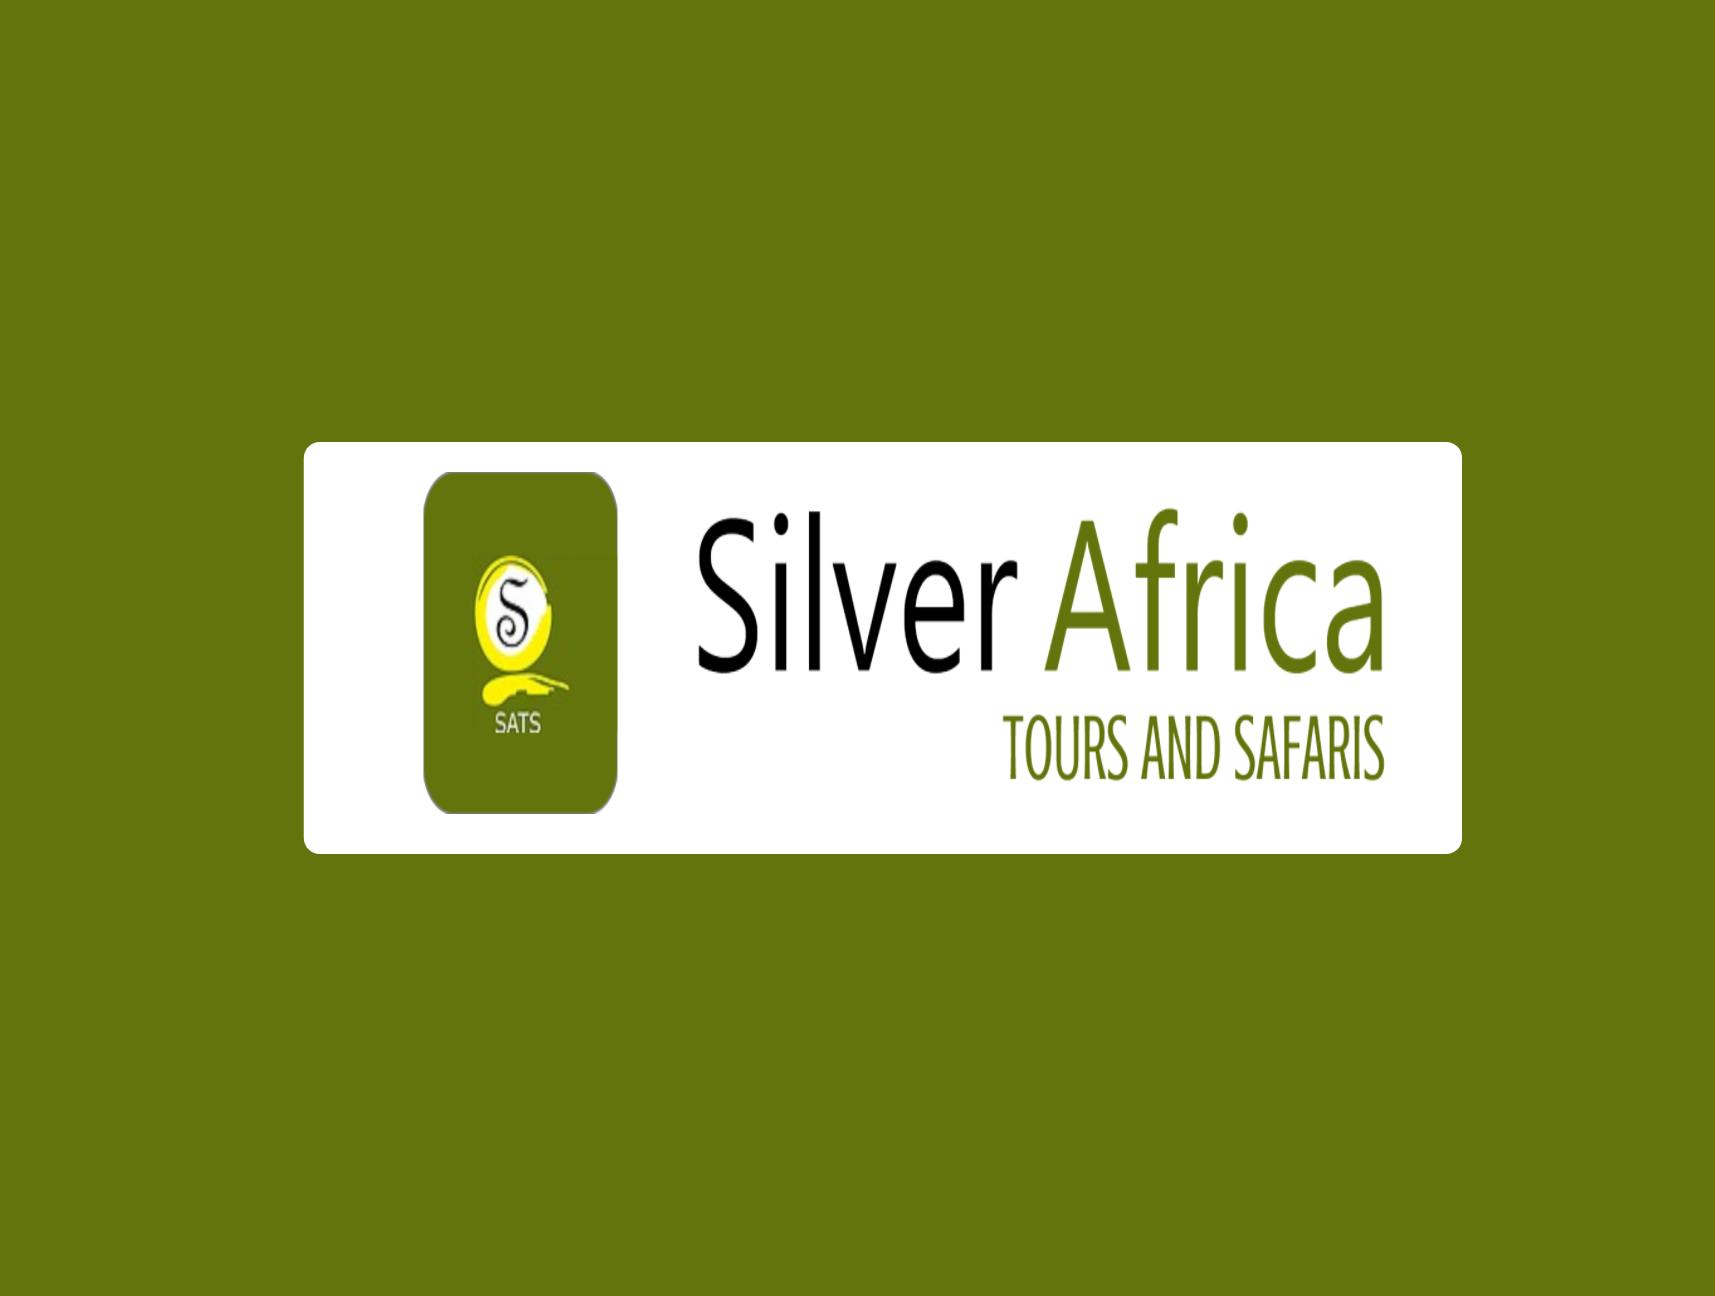 Silver Africa Tours & Safaris Ltd.